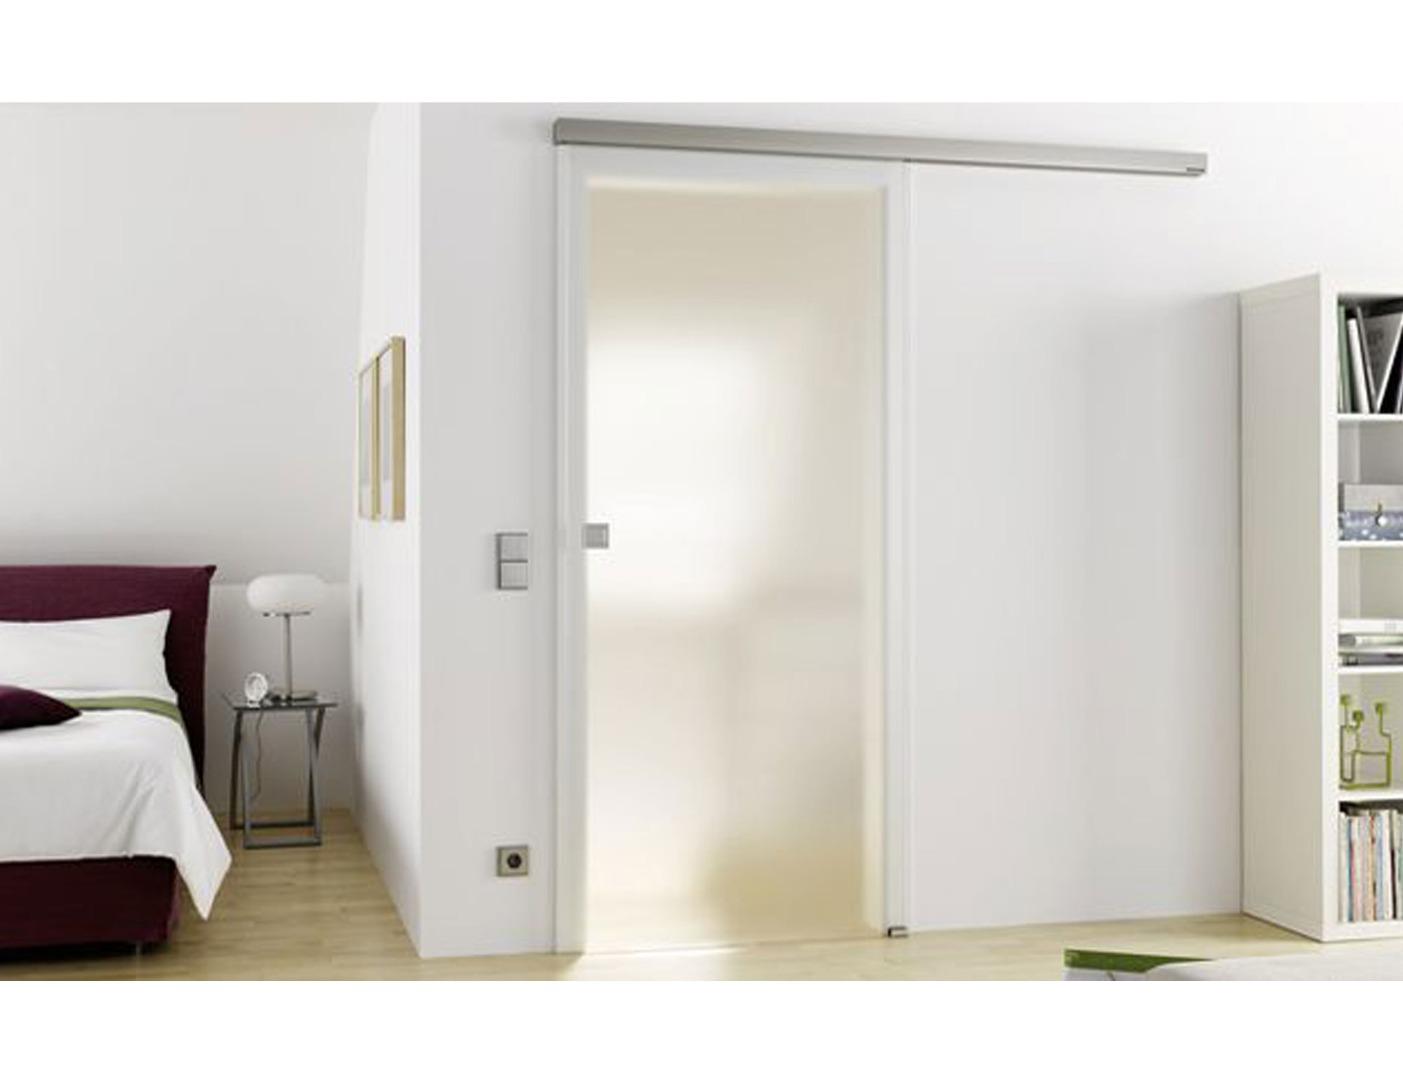 Bespoke Opaque Glass Door Made From Toughened Glass. Discover More About Opaque  Glass And Glass